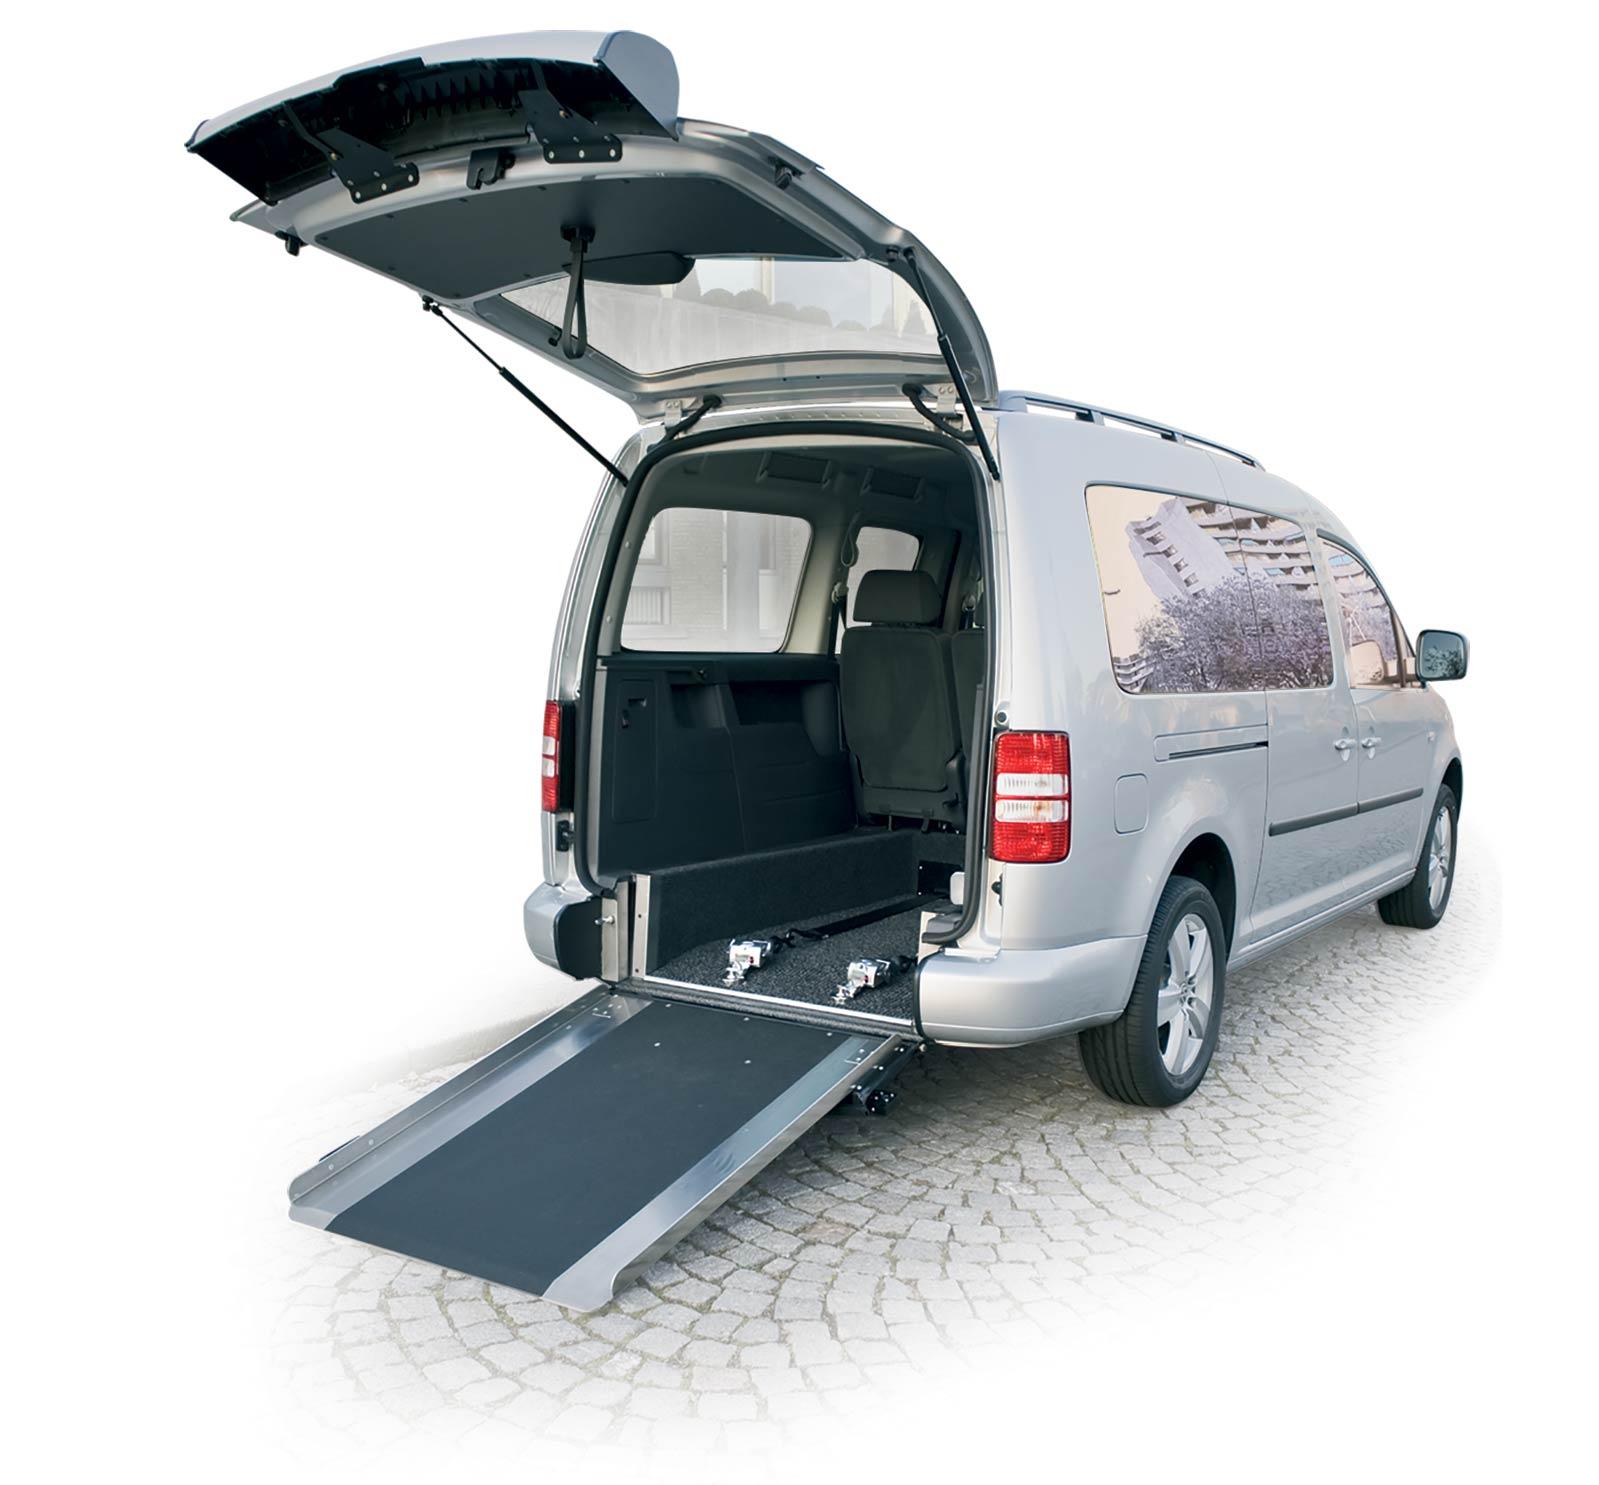 14a43f68b5 VW Caddy Caddy Maxi WAV Lowered Floor and Ramp